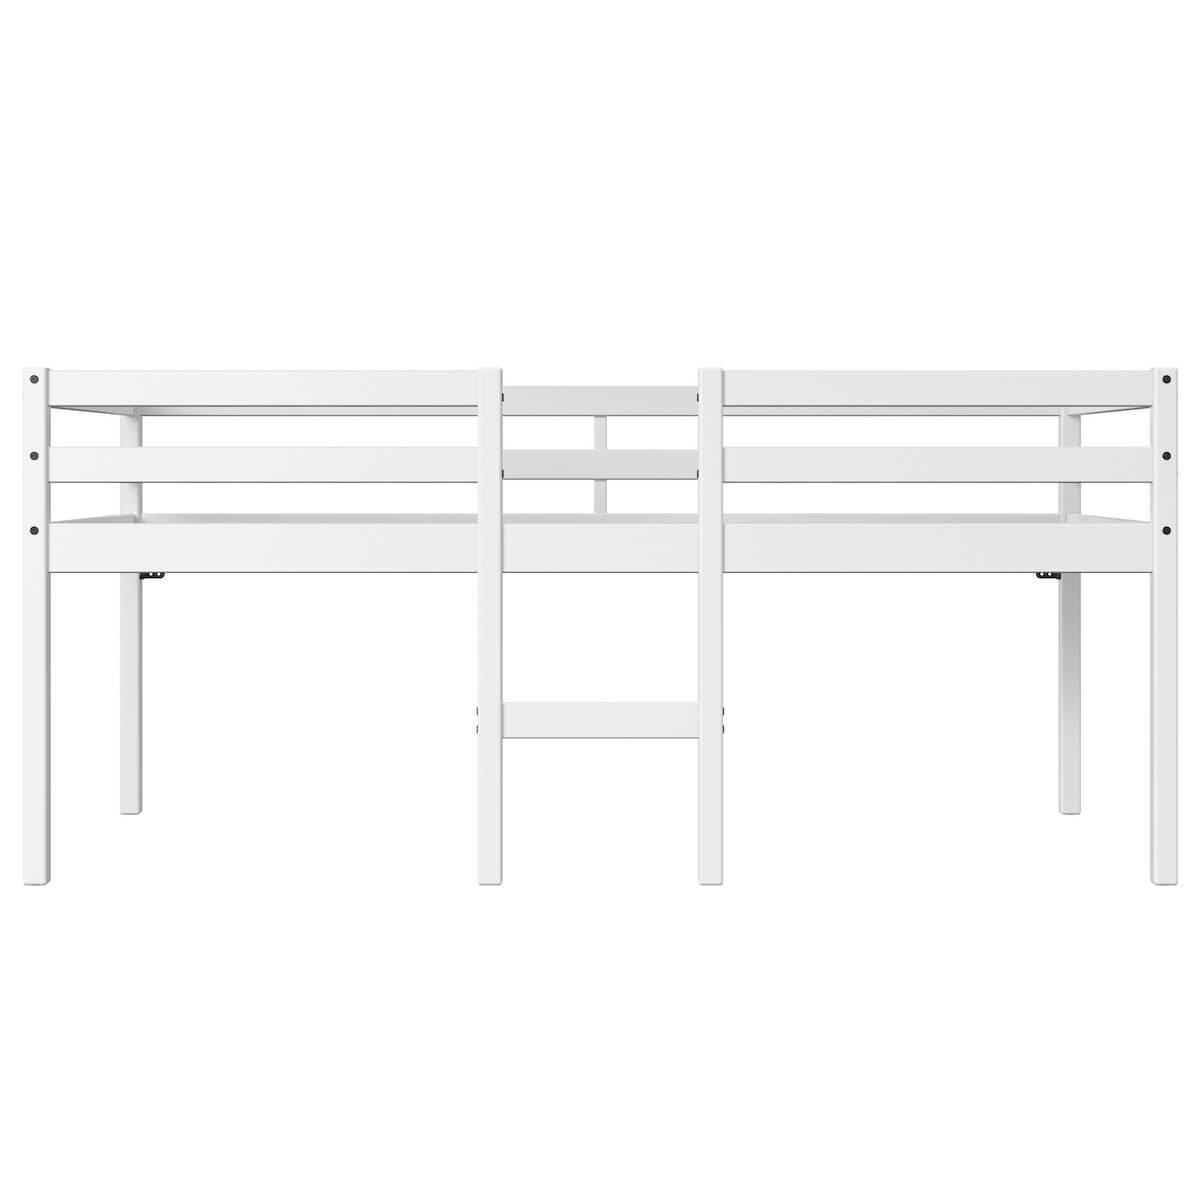 Cama media alta 90x200cm ALFRED Flexa blanco